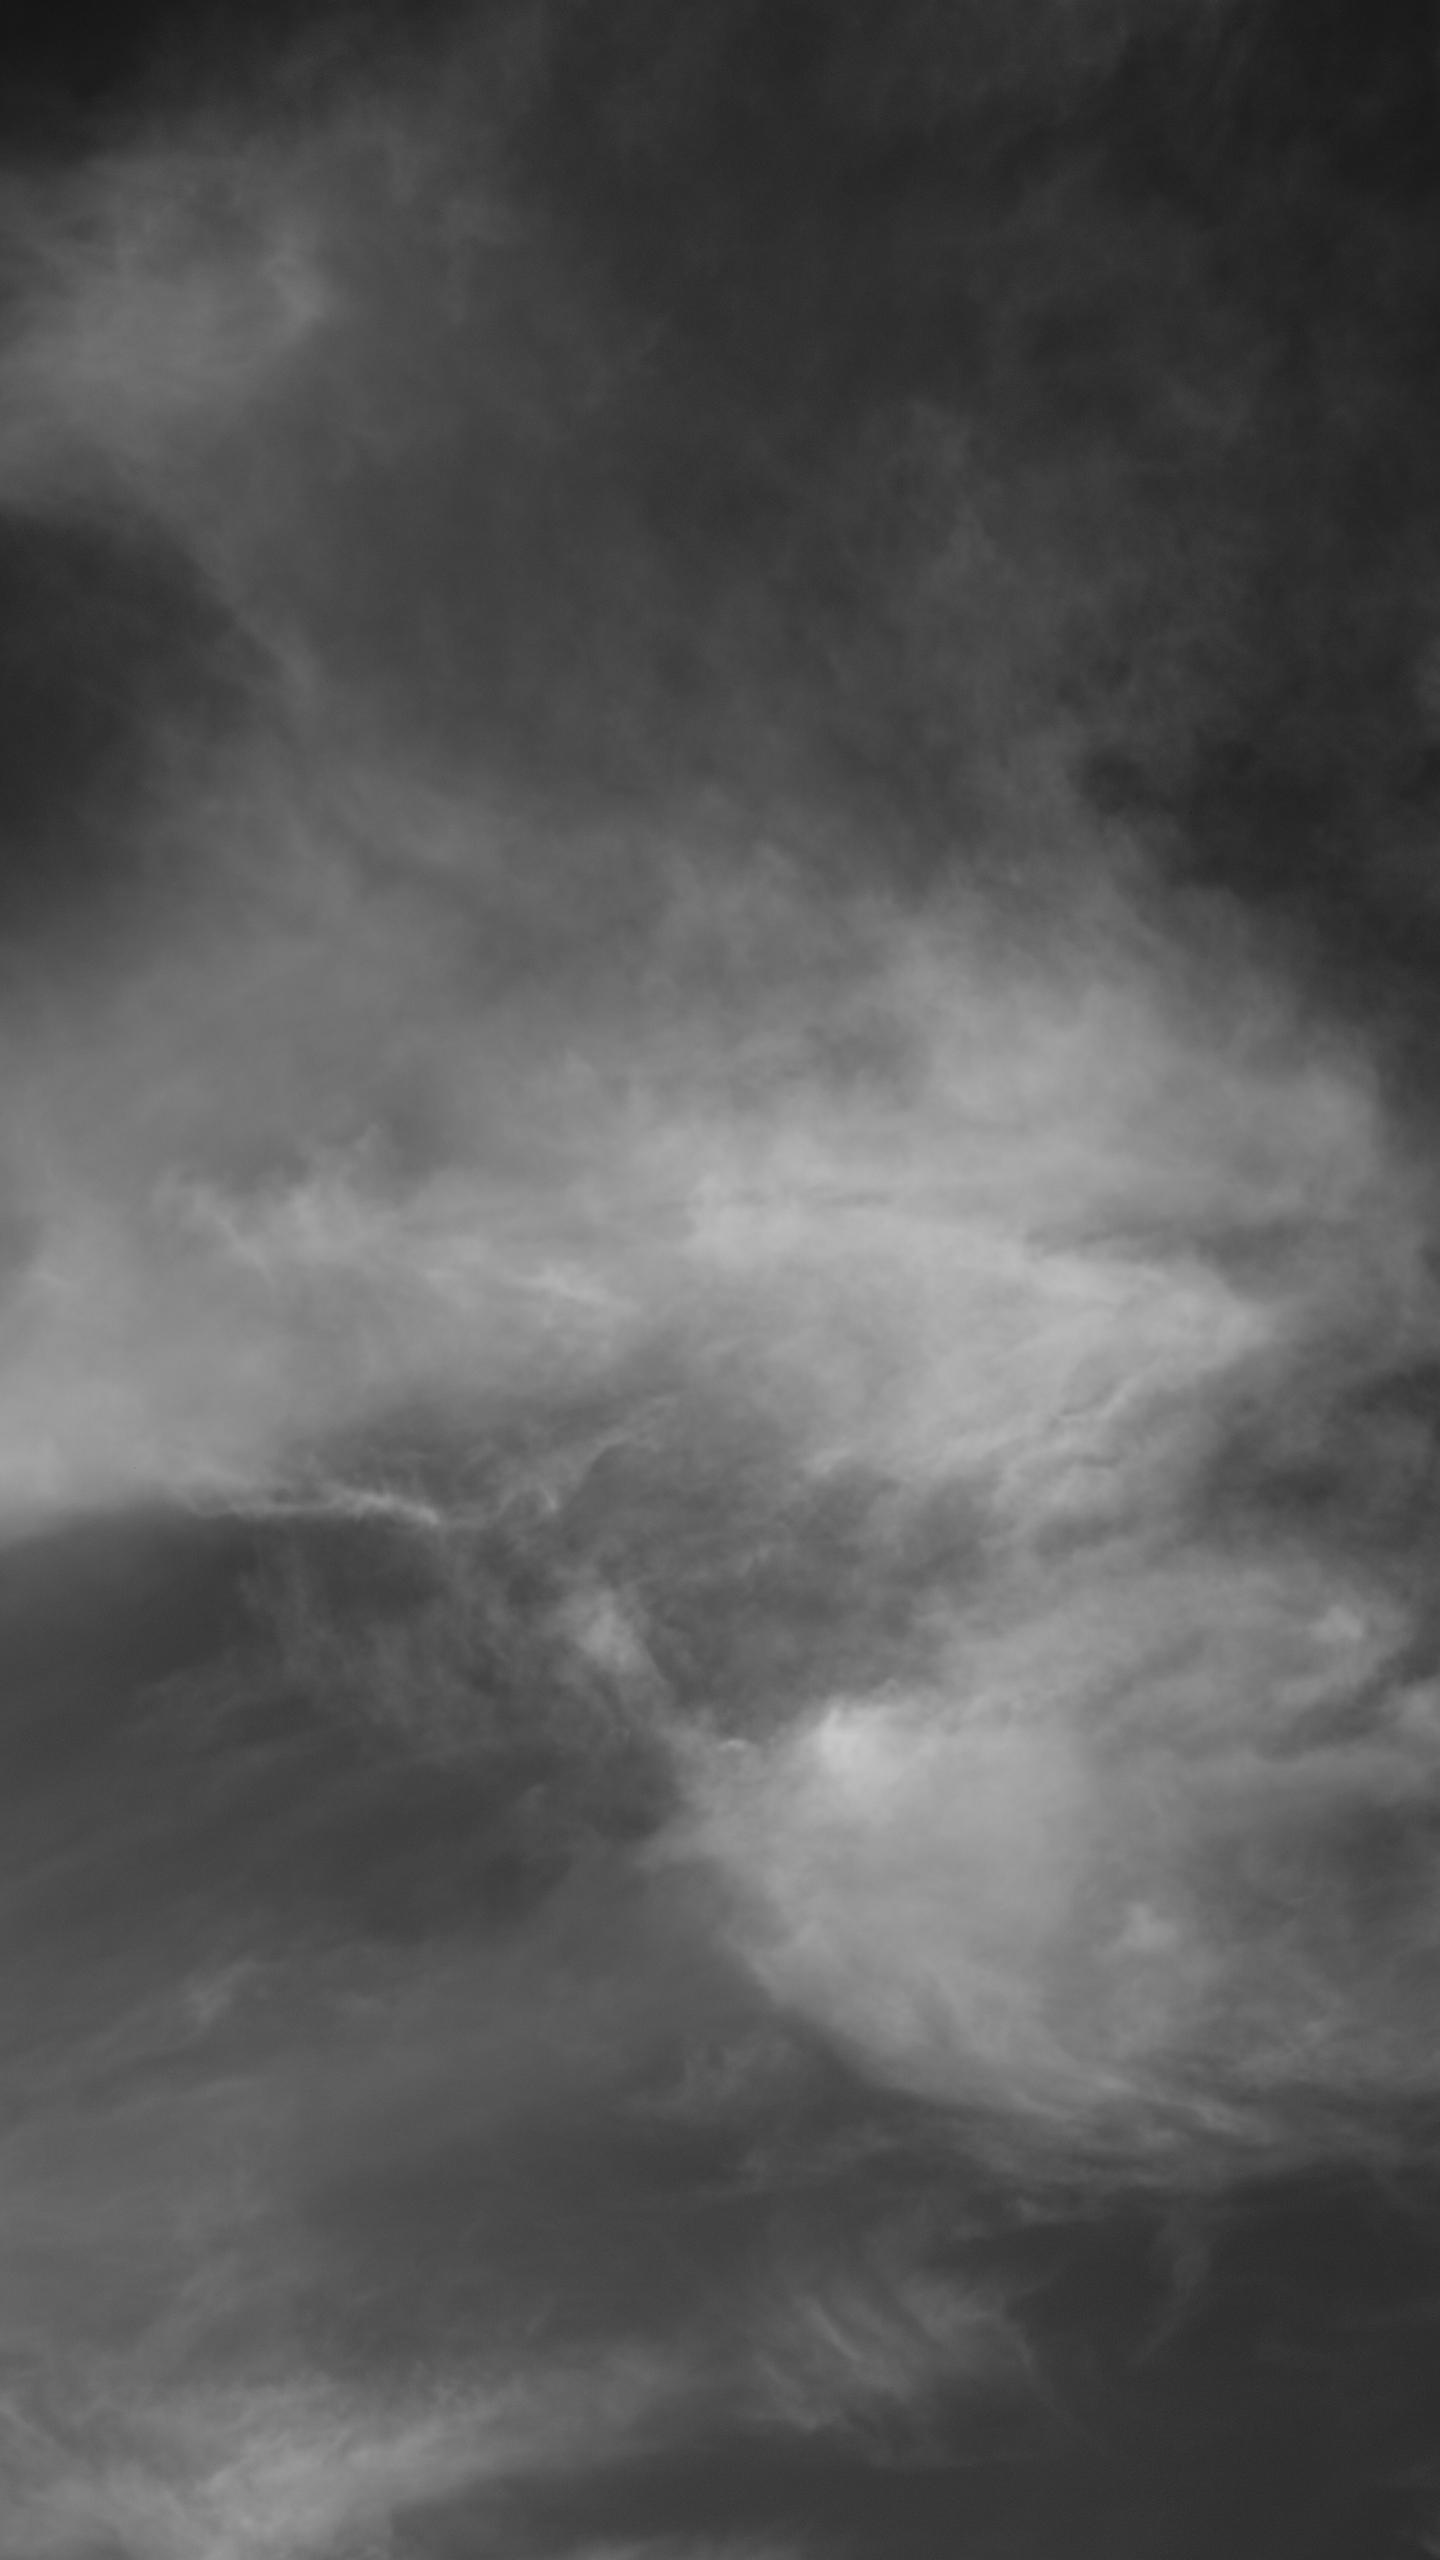 Dark Grey Aesthetic Wallpapers Top Free Dark Grey Aesthetic Backgrounds Wallpaperaccess Blue gray aesthetic dark grey marble background black grey aesthetic aesthetic dark grunge backgrounds aesthetic light grey backgrounds gray dark clouds as background. dark grey aesthetic wallpapers top